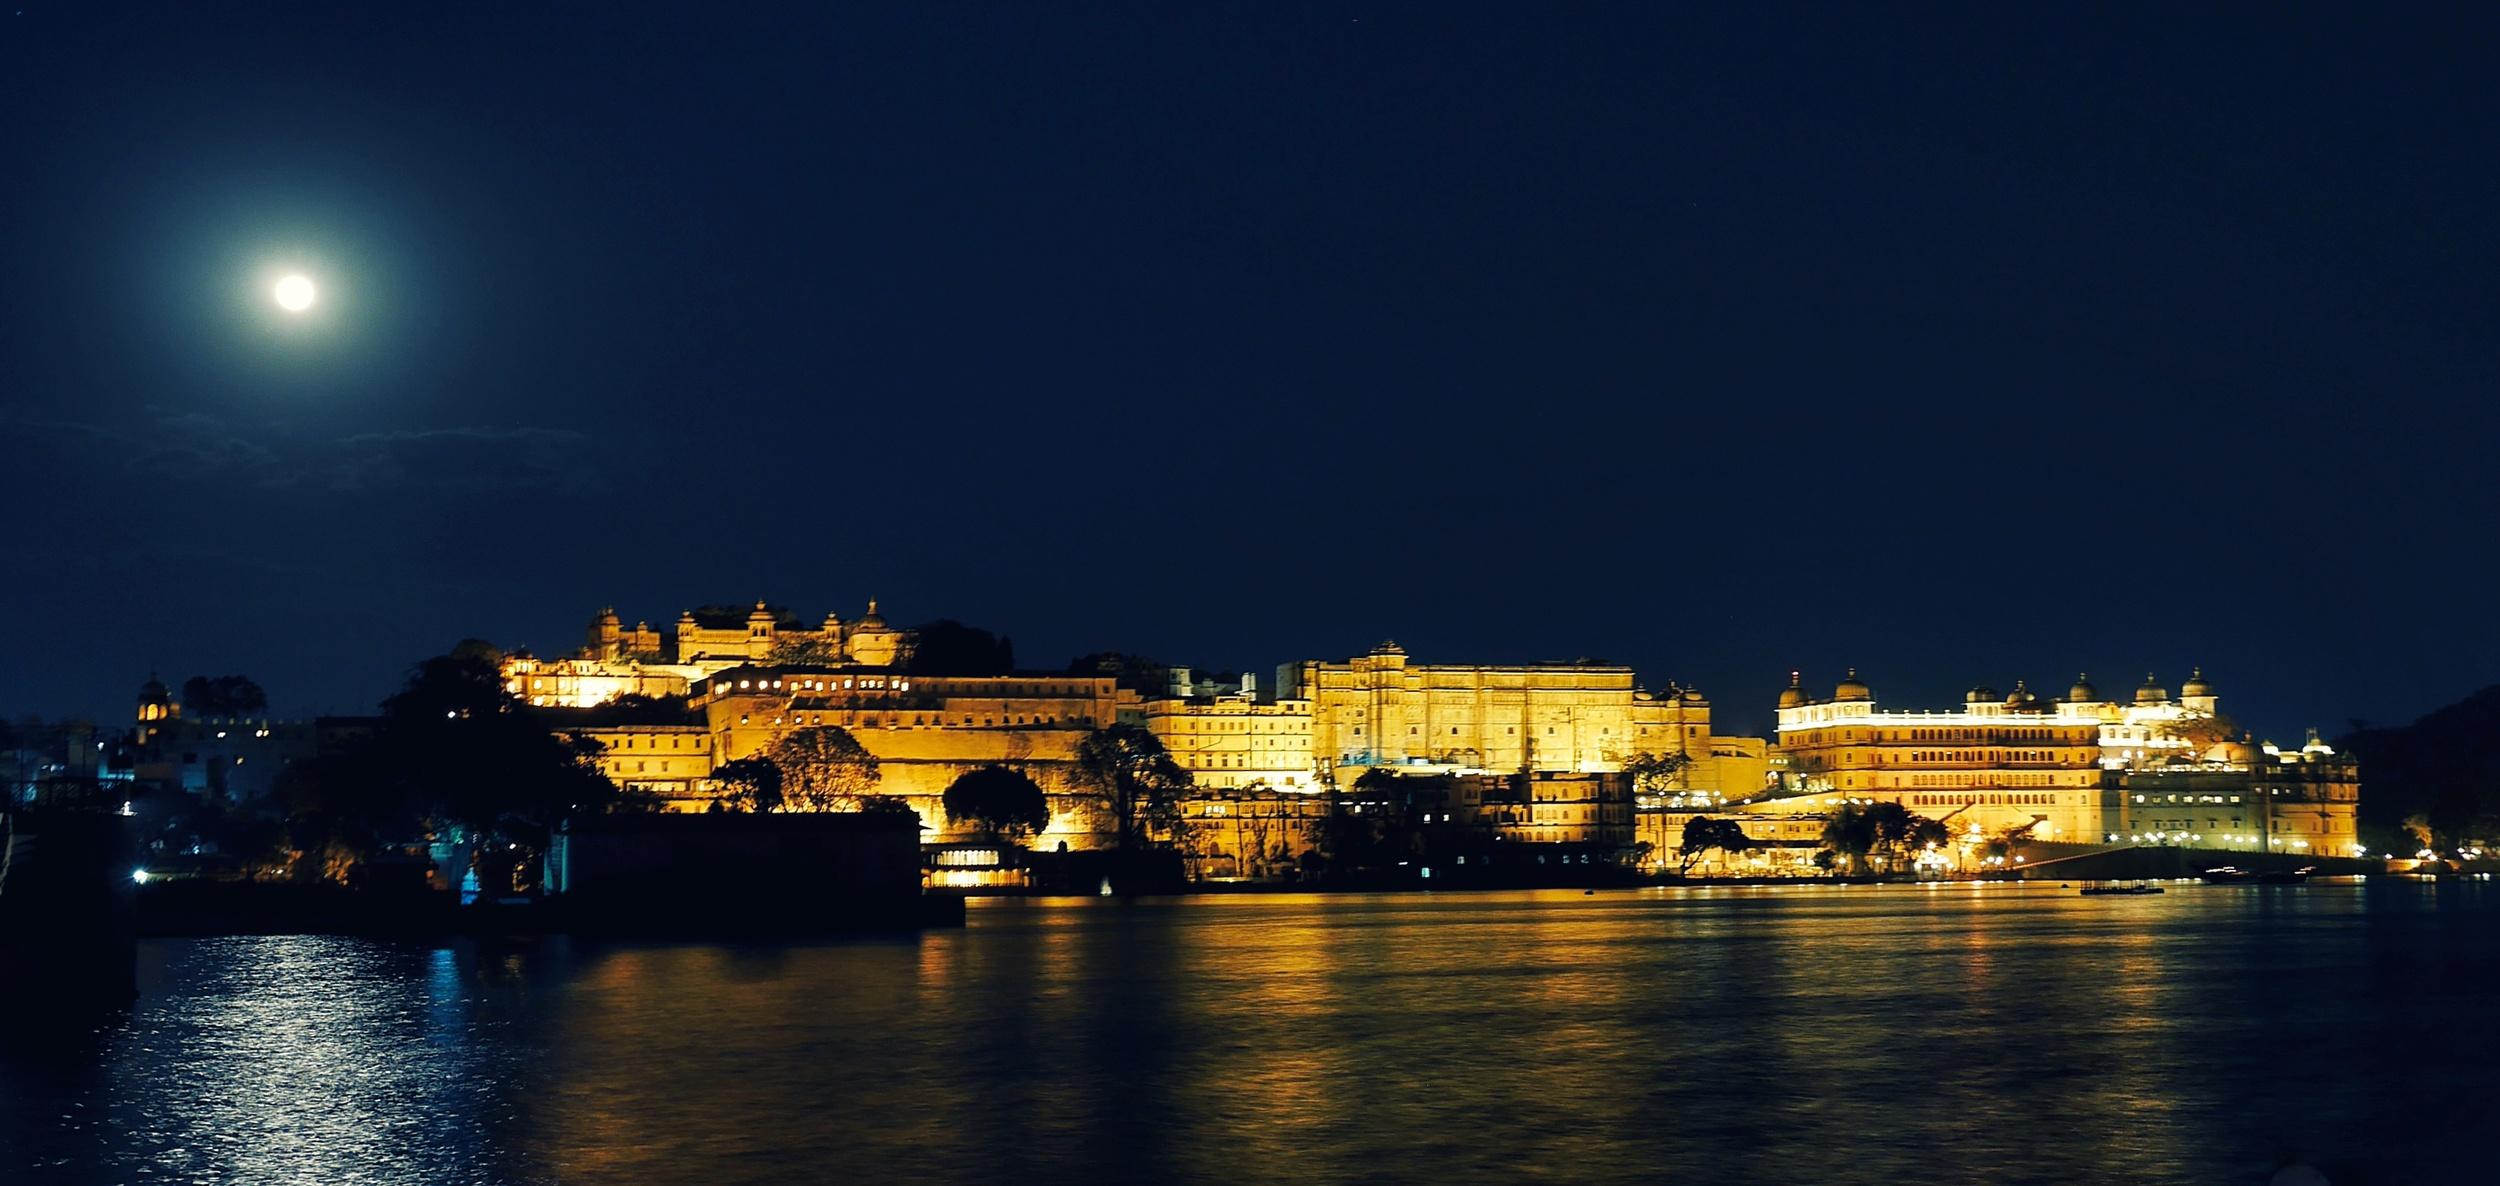 Moonlit City Palace2.jpg